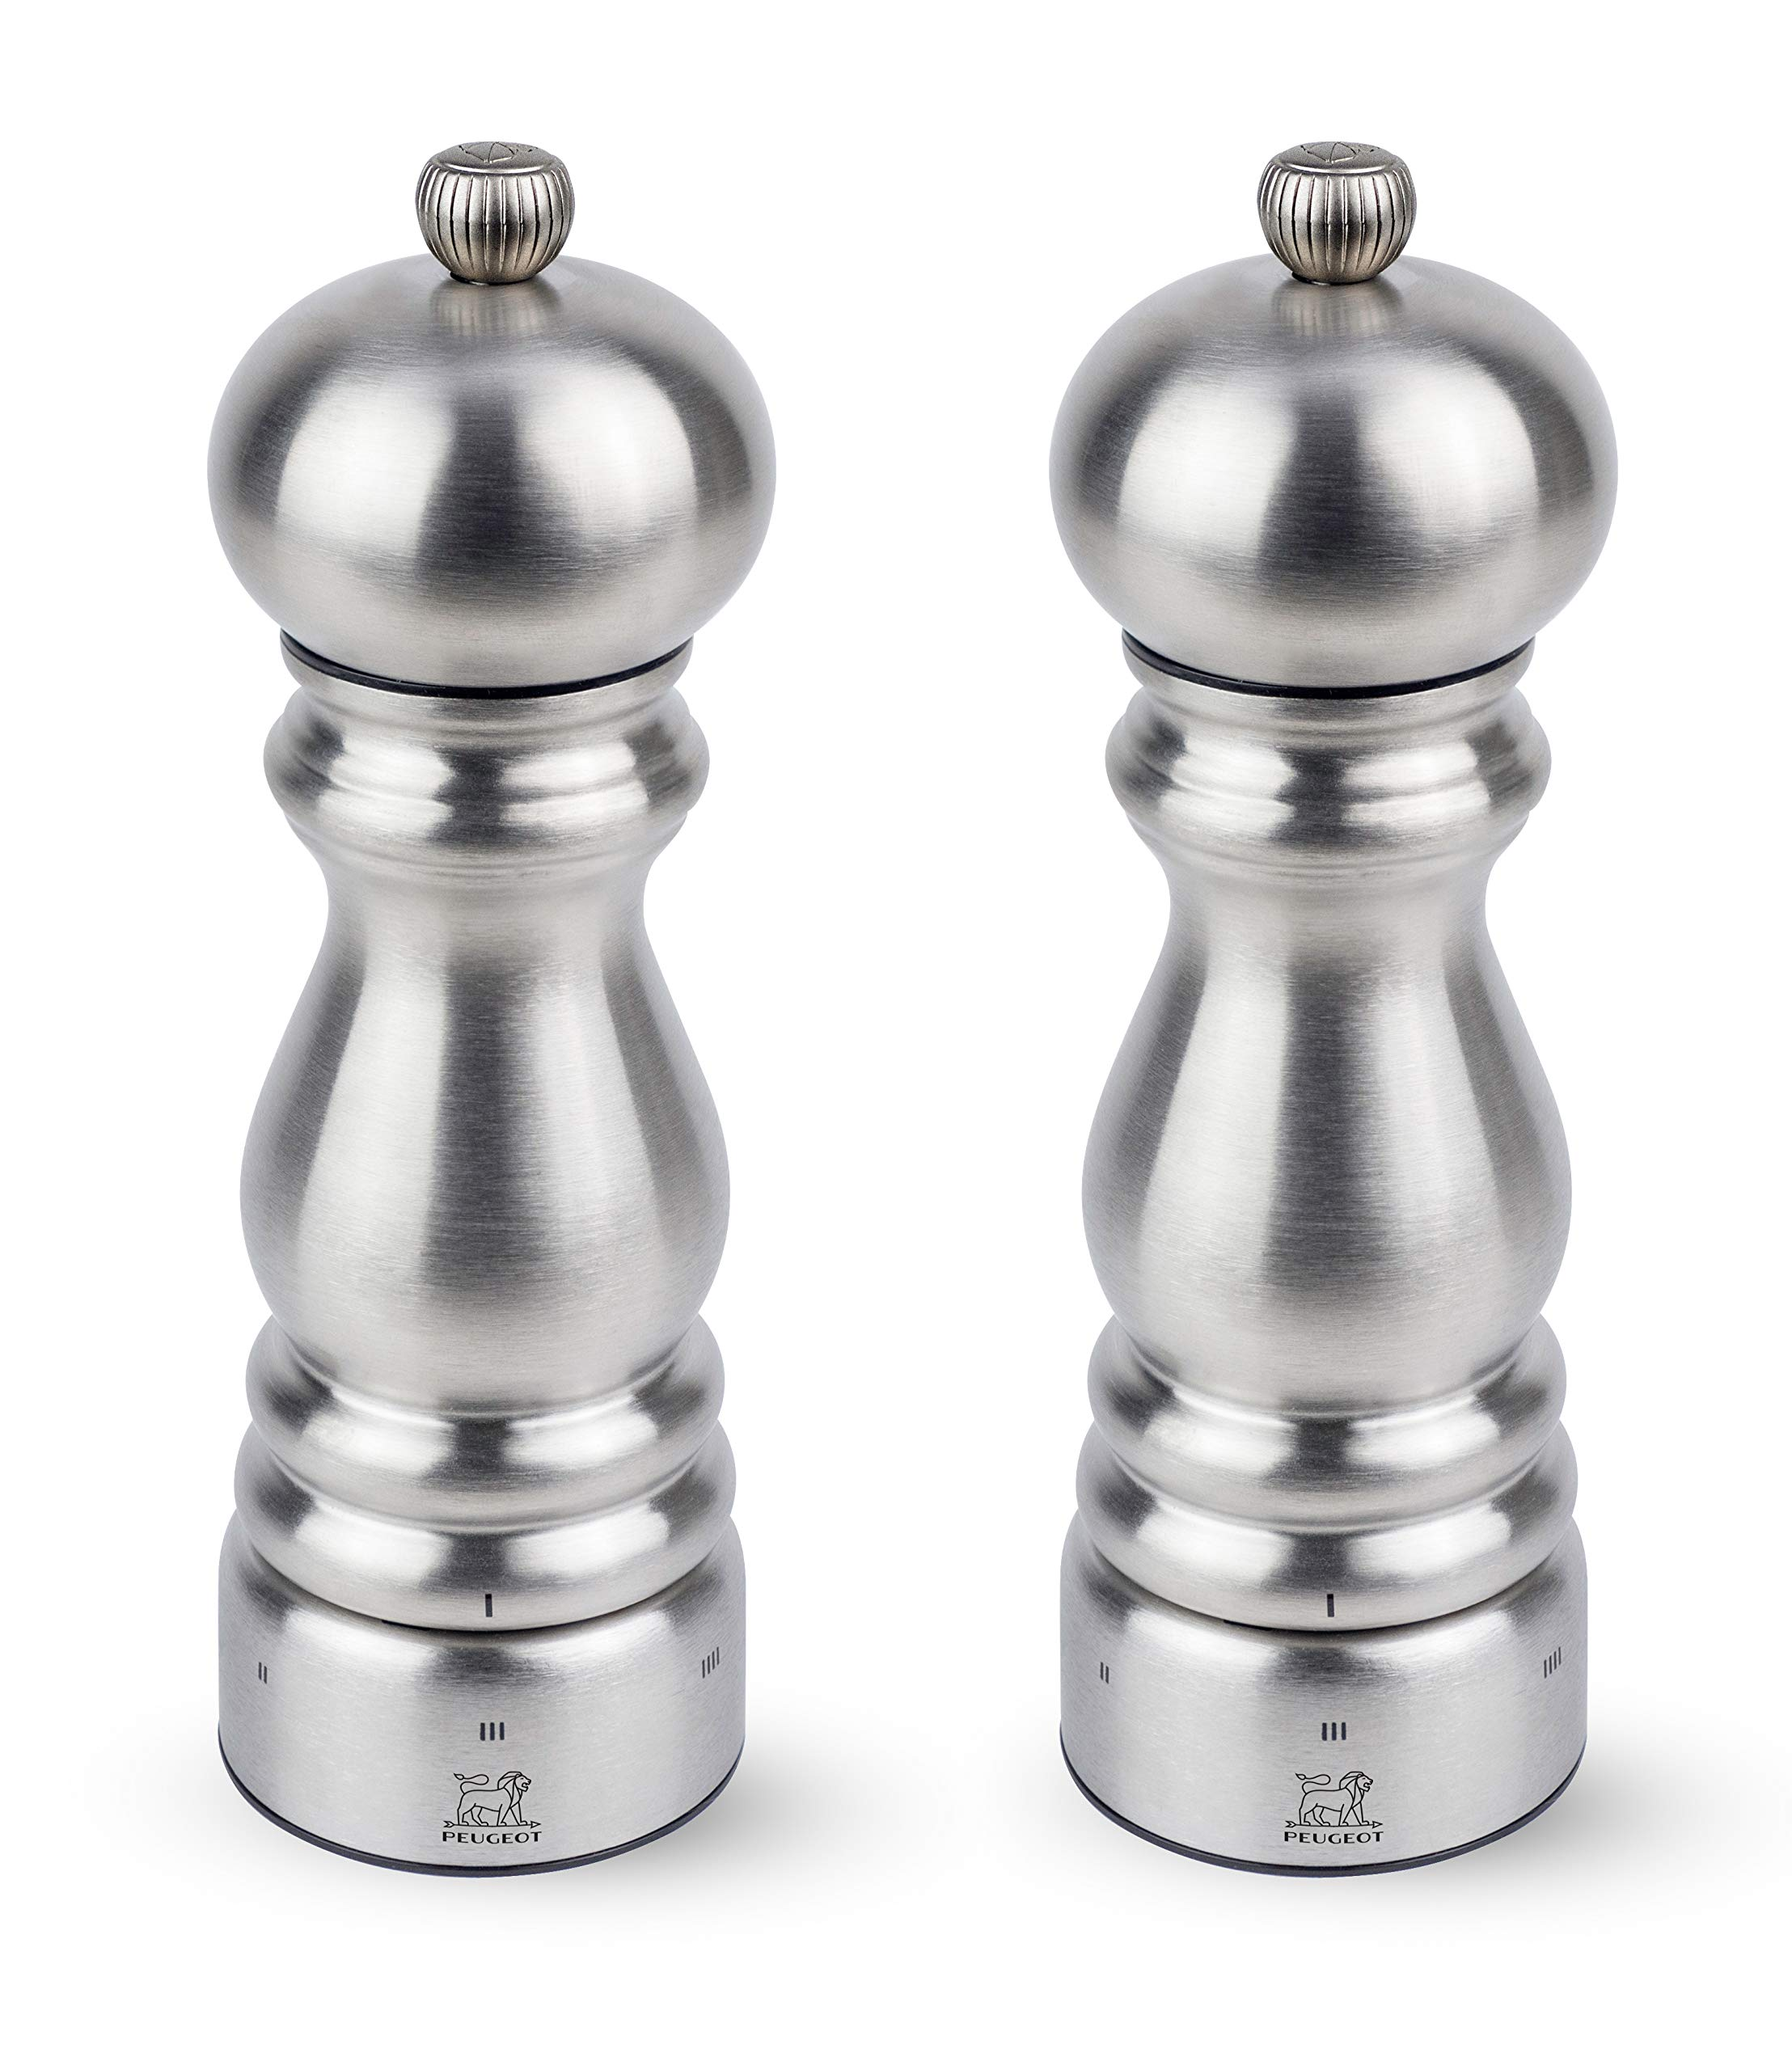 Peugeot Paris Chef u'Select Stainless Steel 7'' Pepper & Salt Mill Set by Peugeot